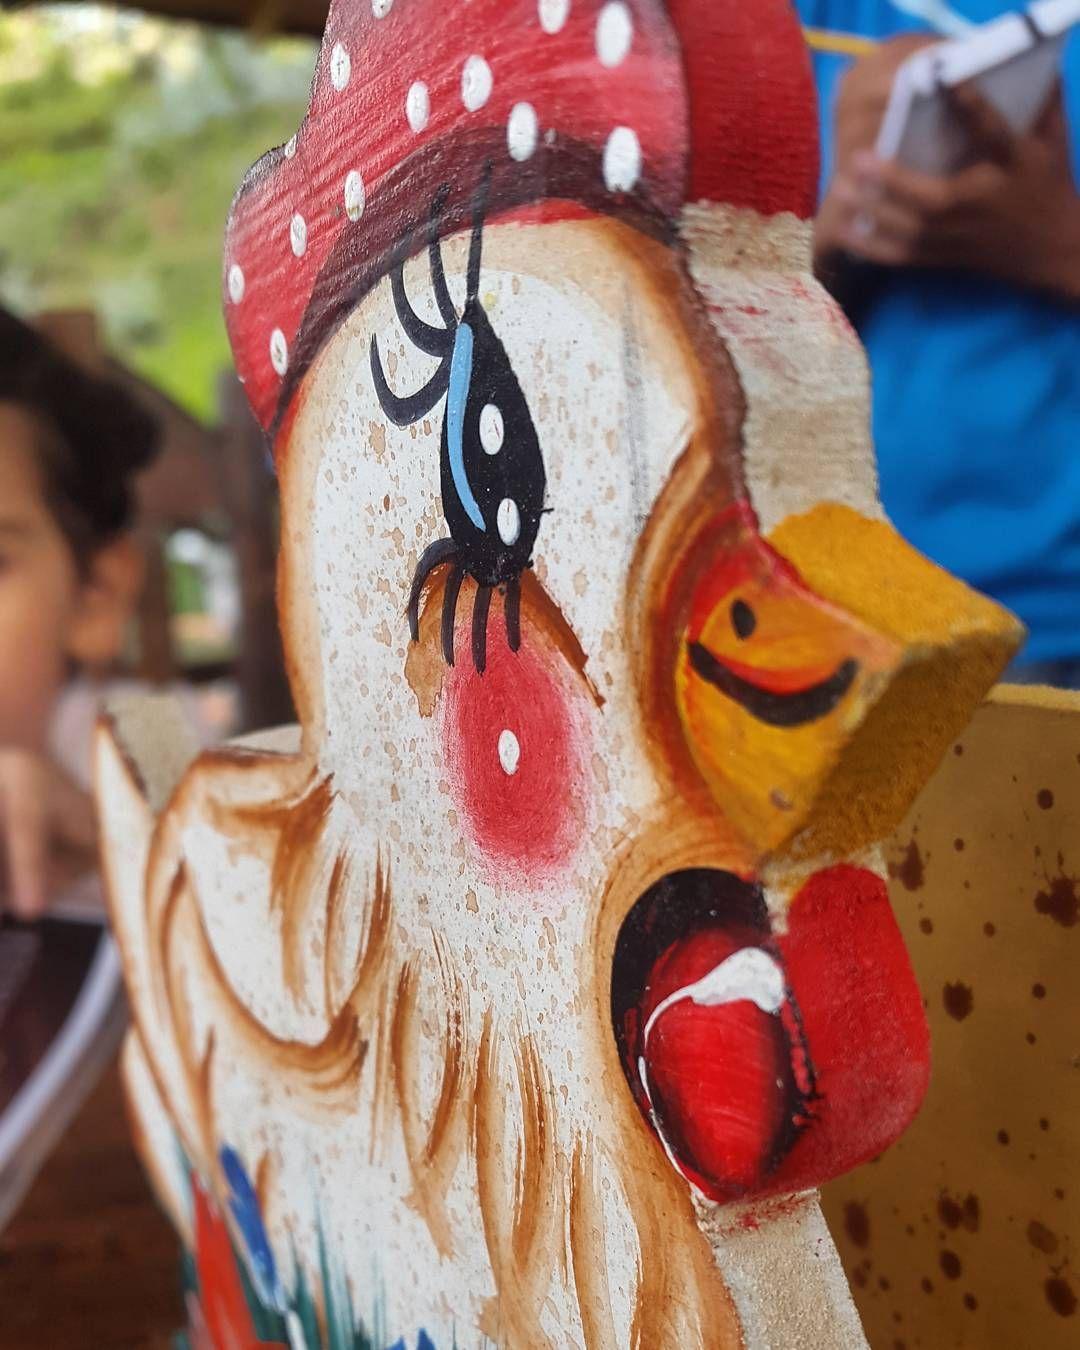 Trozos de Cultura Venezolana #gf_ve #igers #venezuela #ve #ig_venezuela